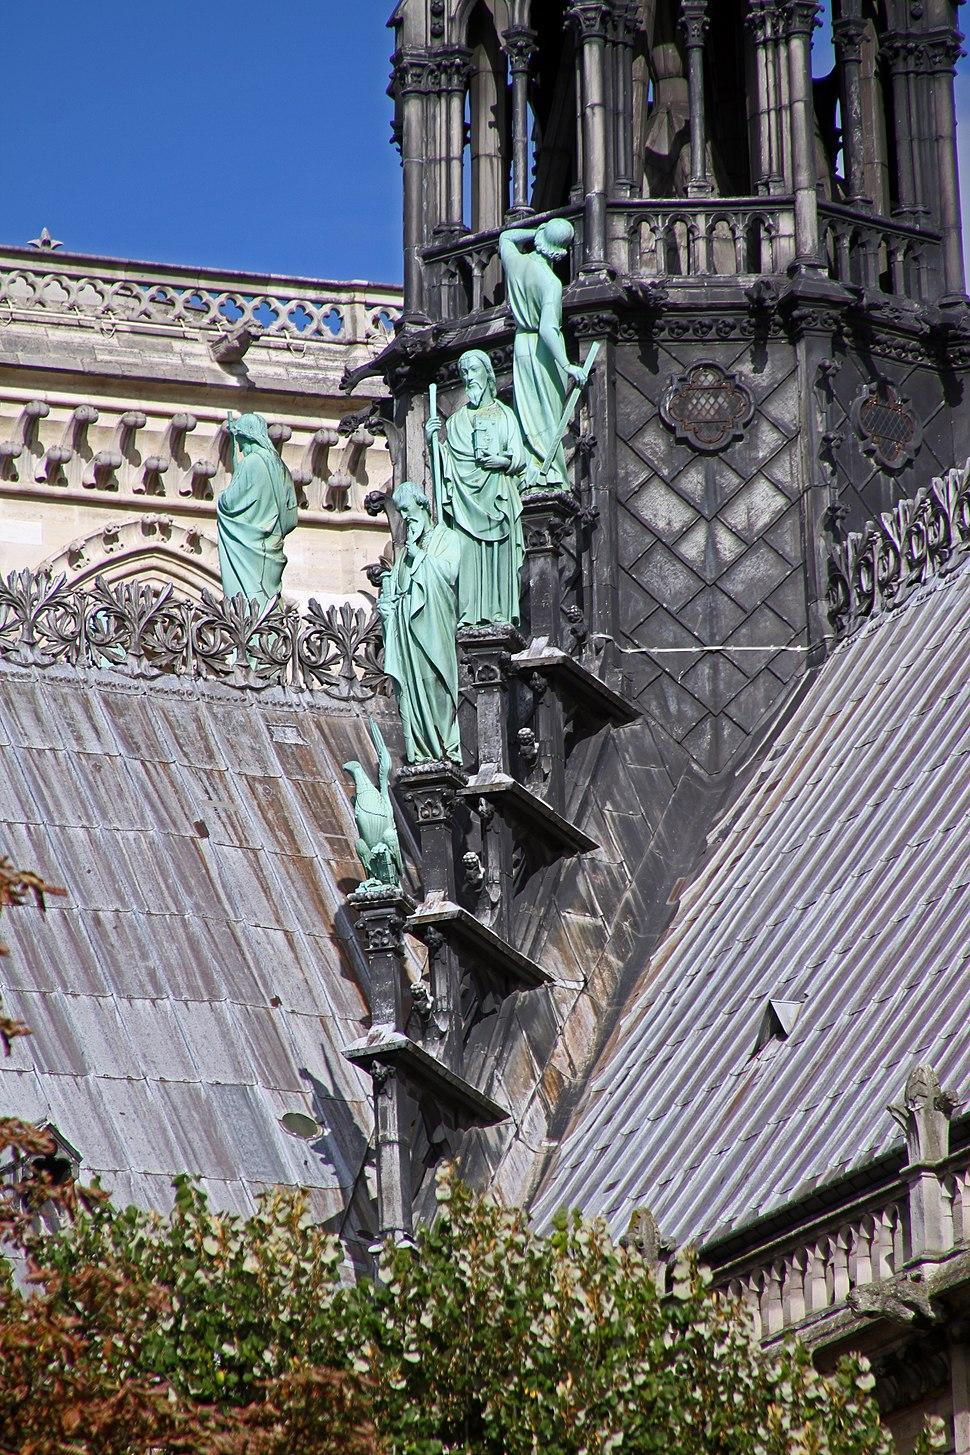 Paris-Notre Dame-136-Figuren am Vierungsturm-2017-gje